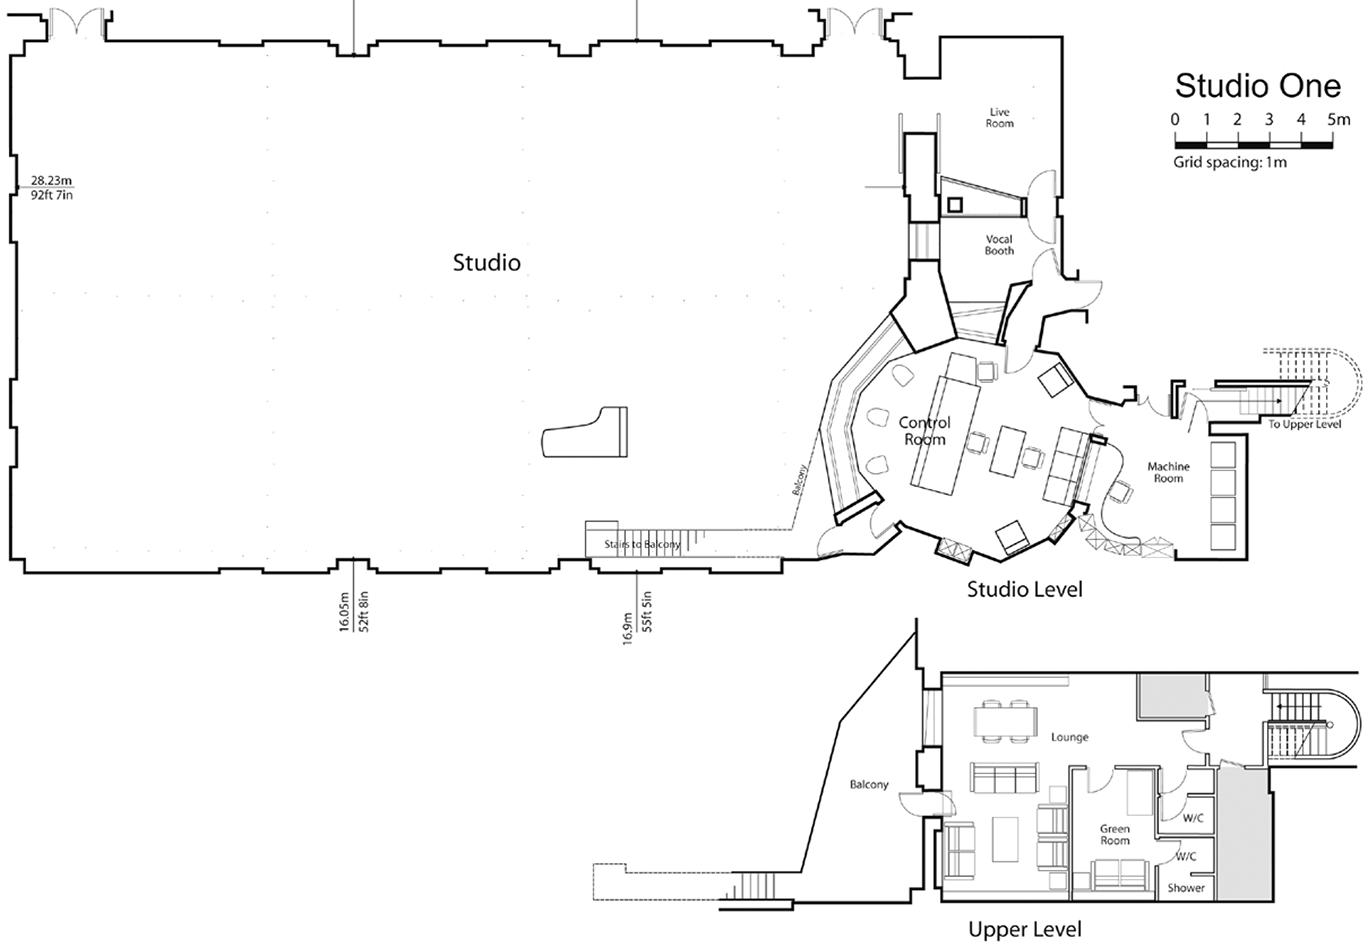 Studio One Floorplan